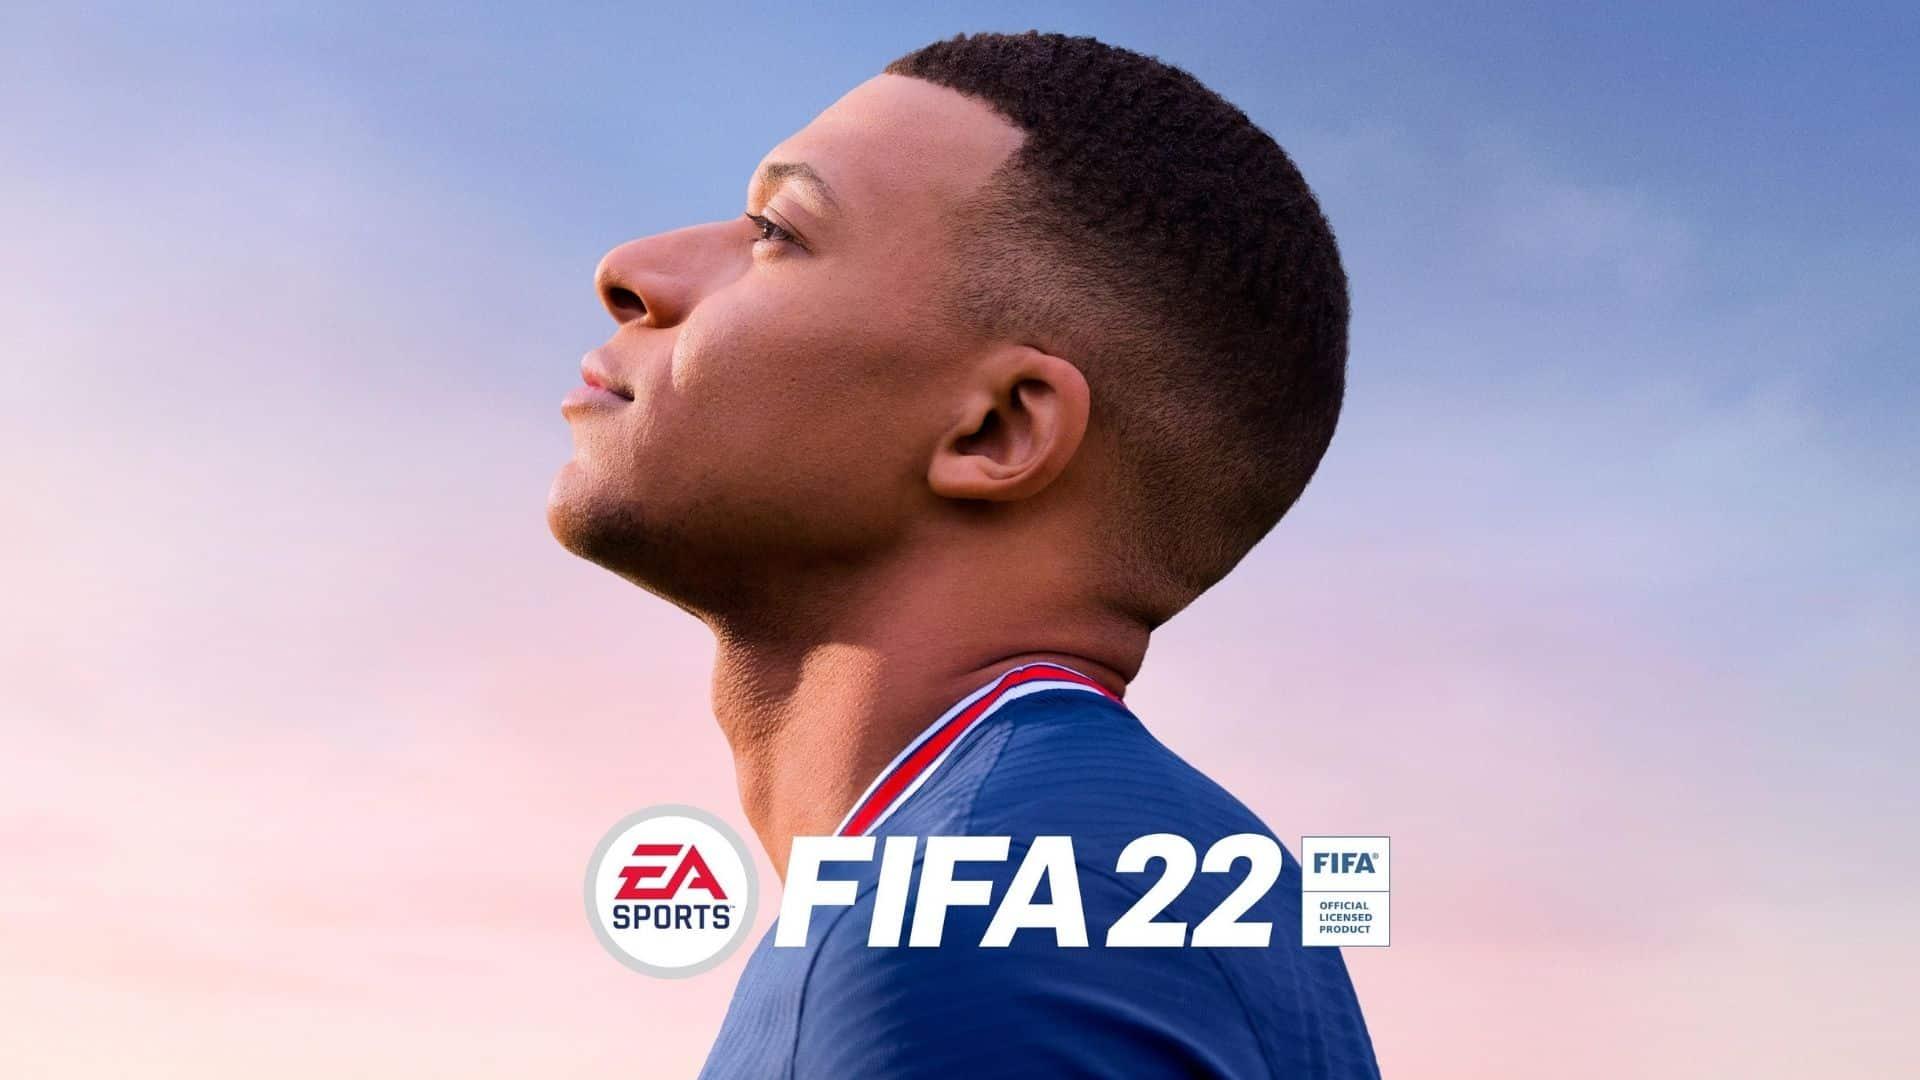 《FIFA 22》开启全新Steam版本